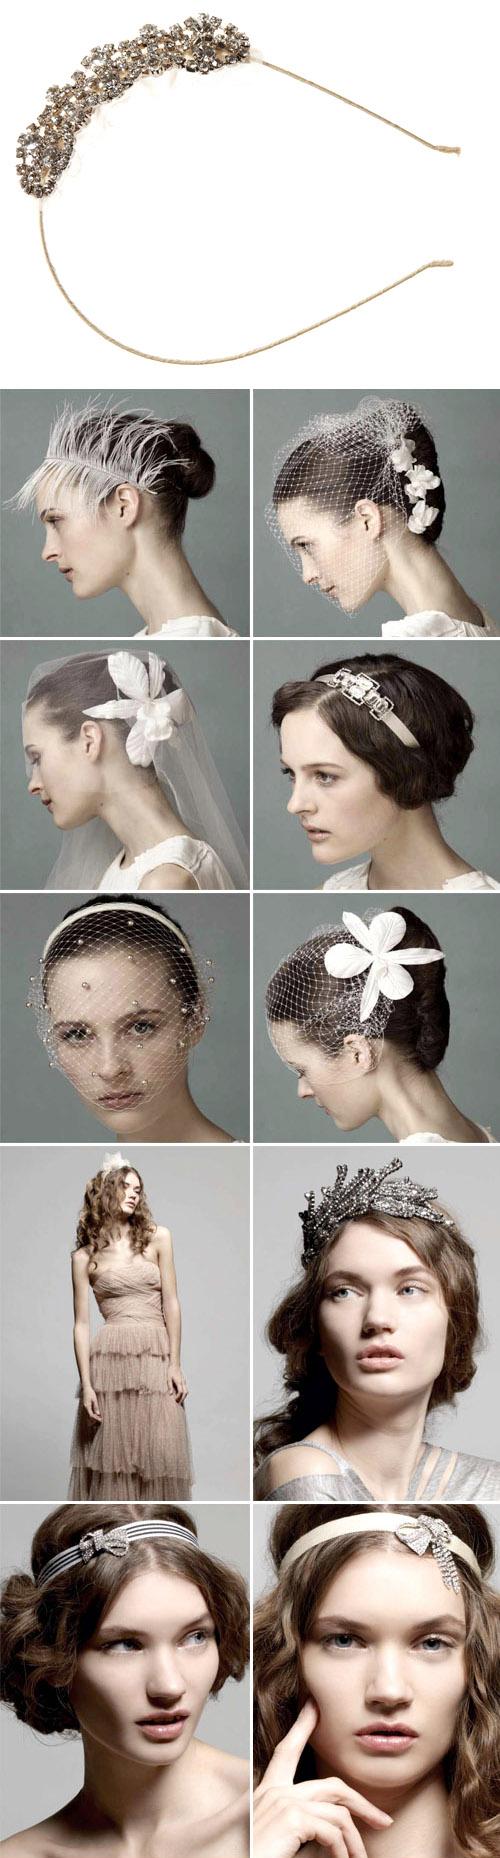 bridal hair veils, headbands and accessories by Jennifer Behr, www.jenniferbehr.com